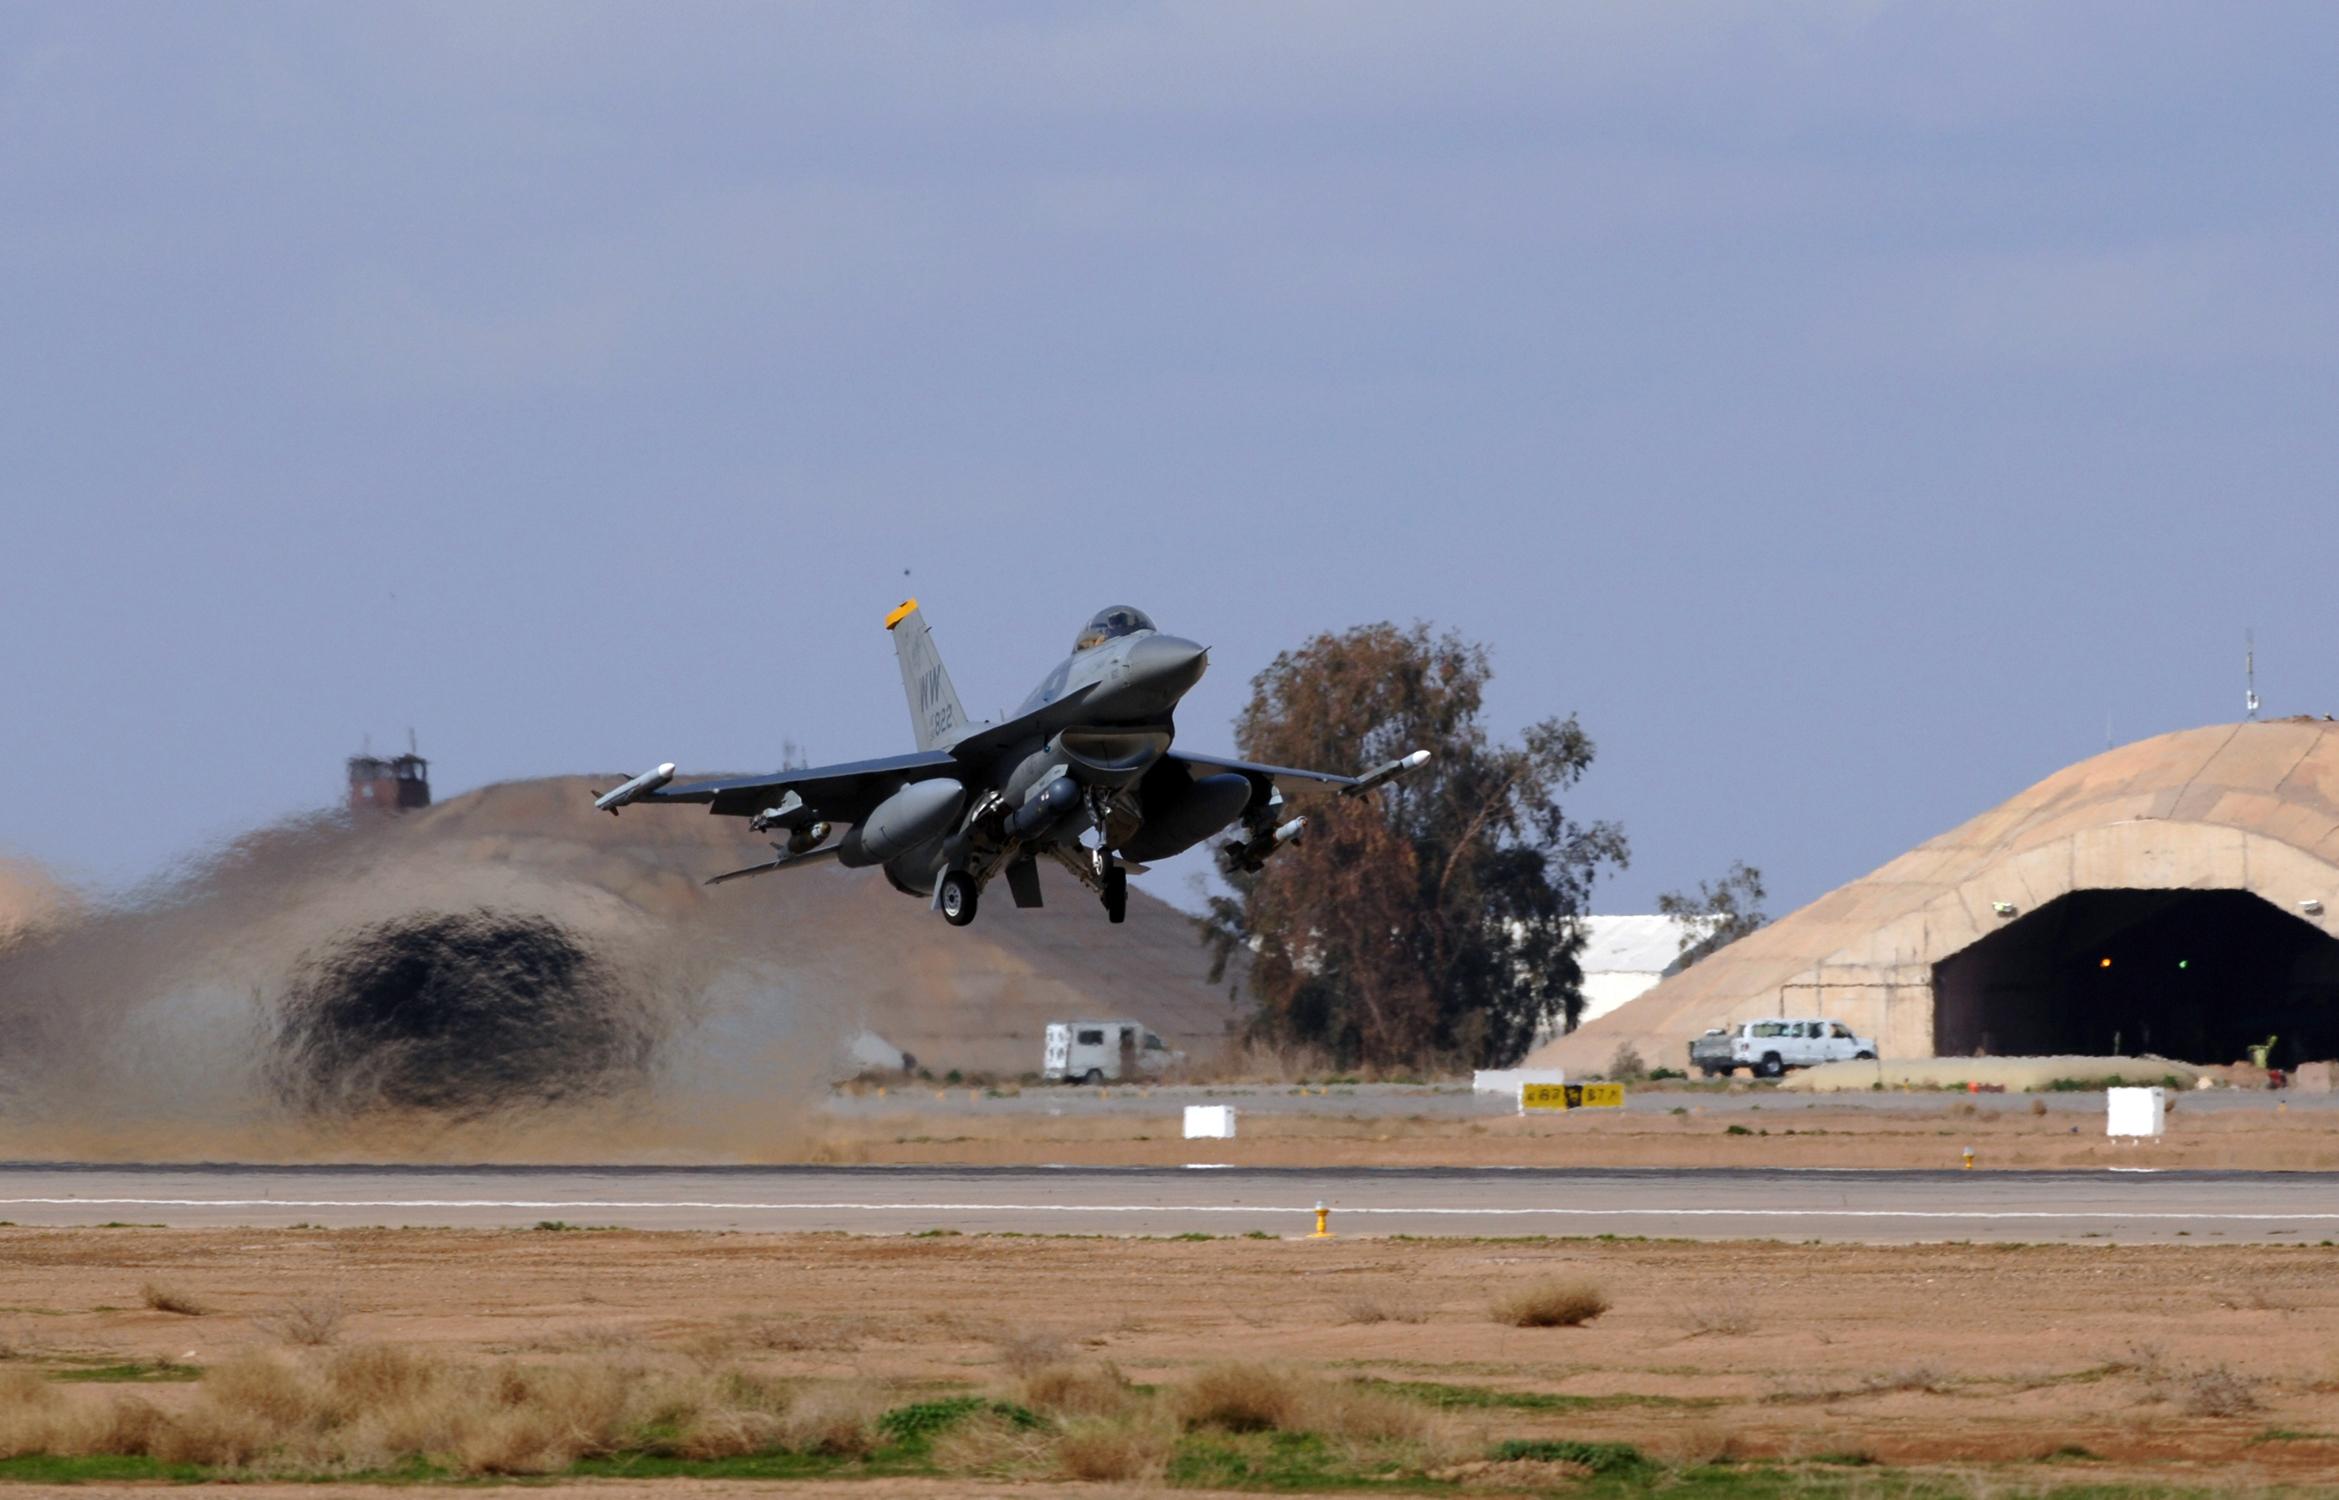 File:Lockheed Martin F-16 takeoff jpg - Wikimedia Commons